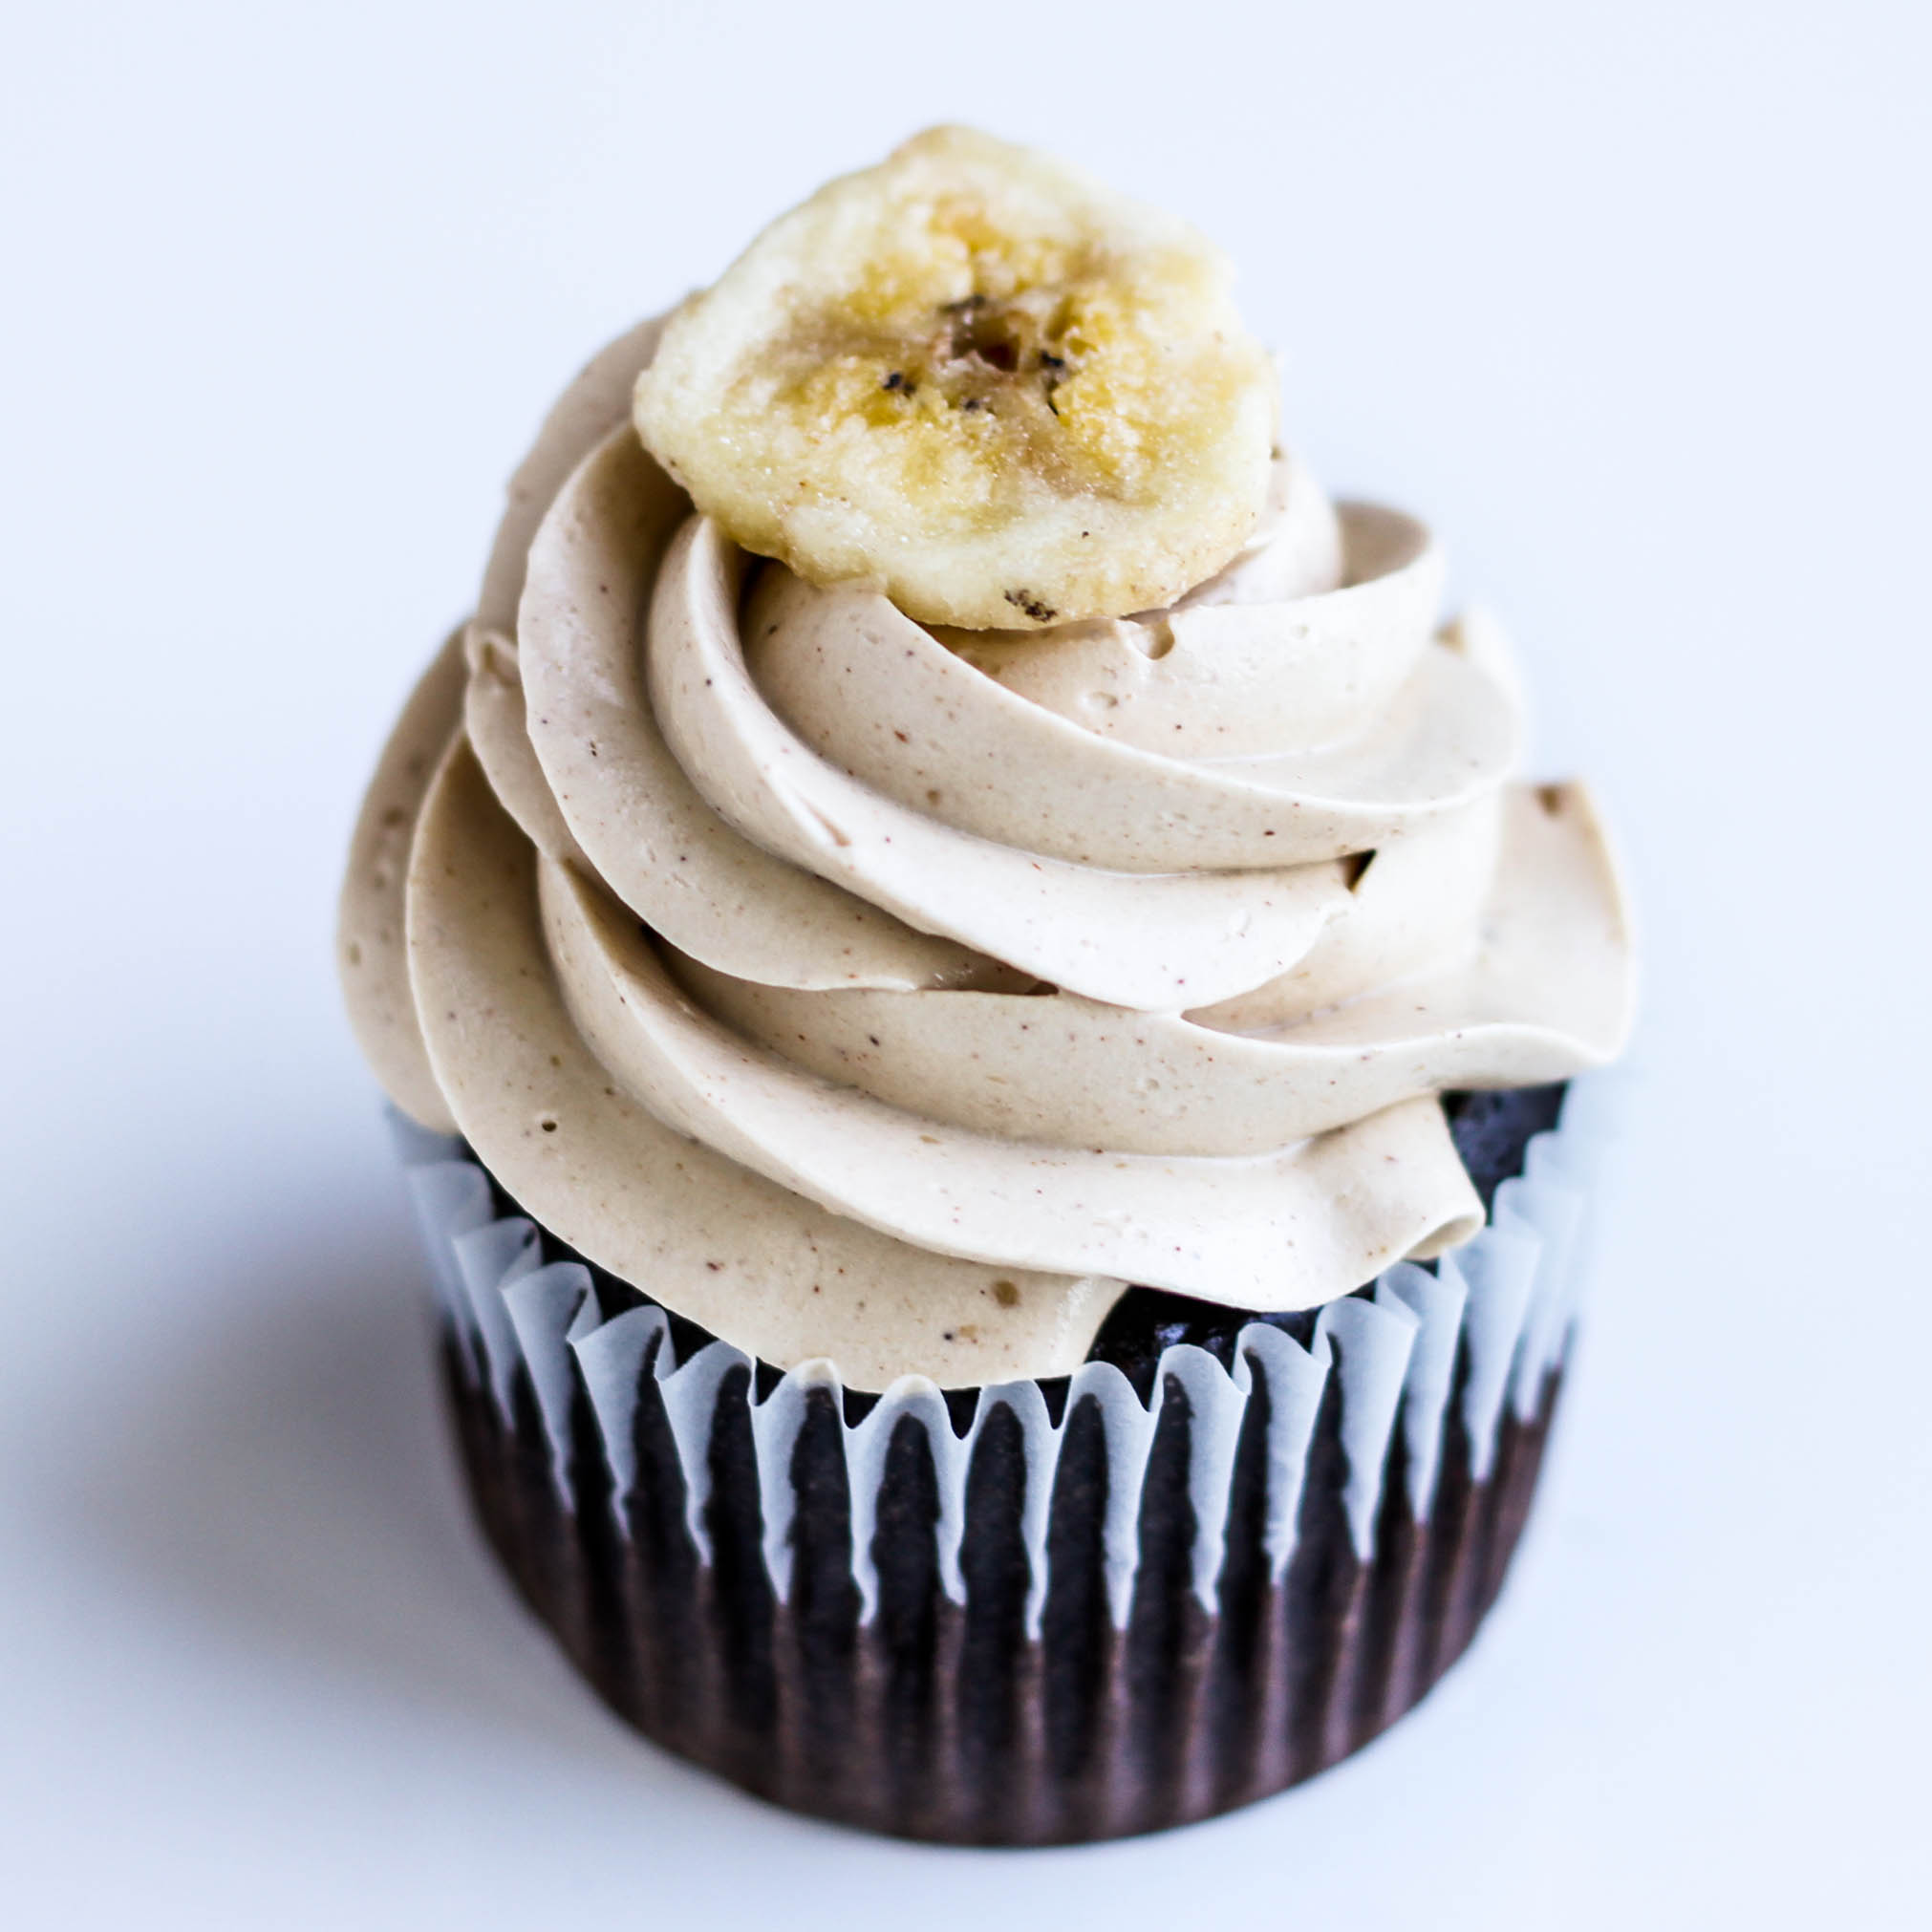 Chocolate Cupcake with Brown Sugar Meringue Frosting